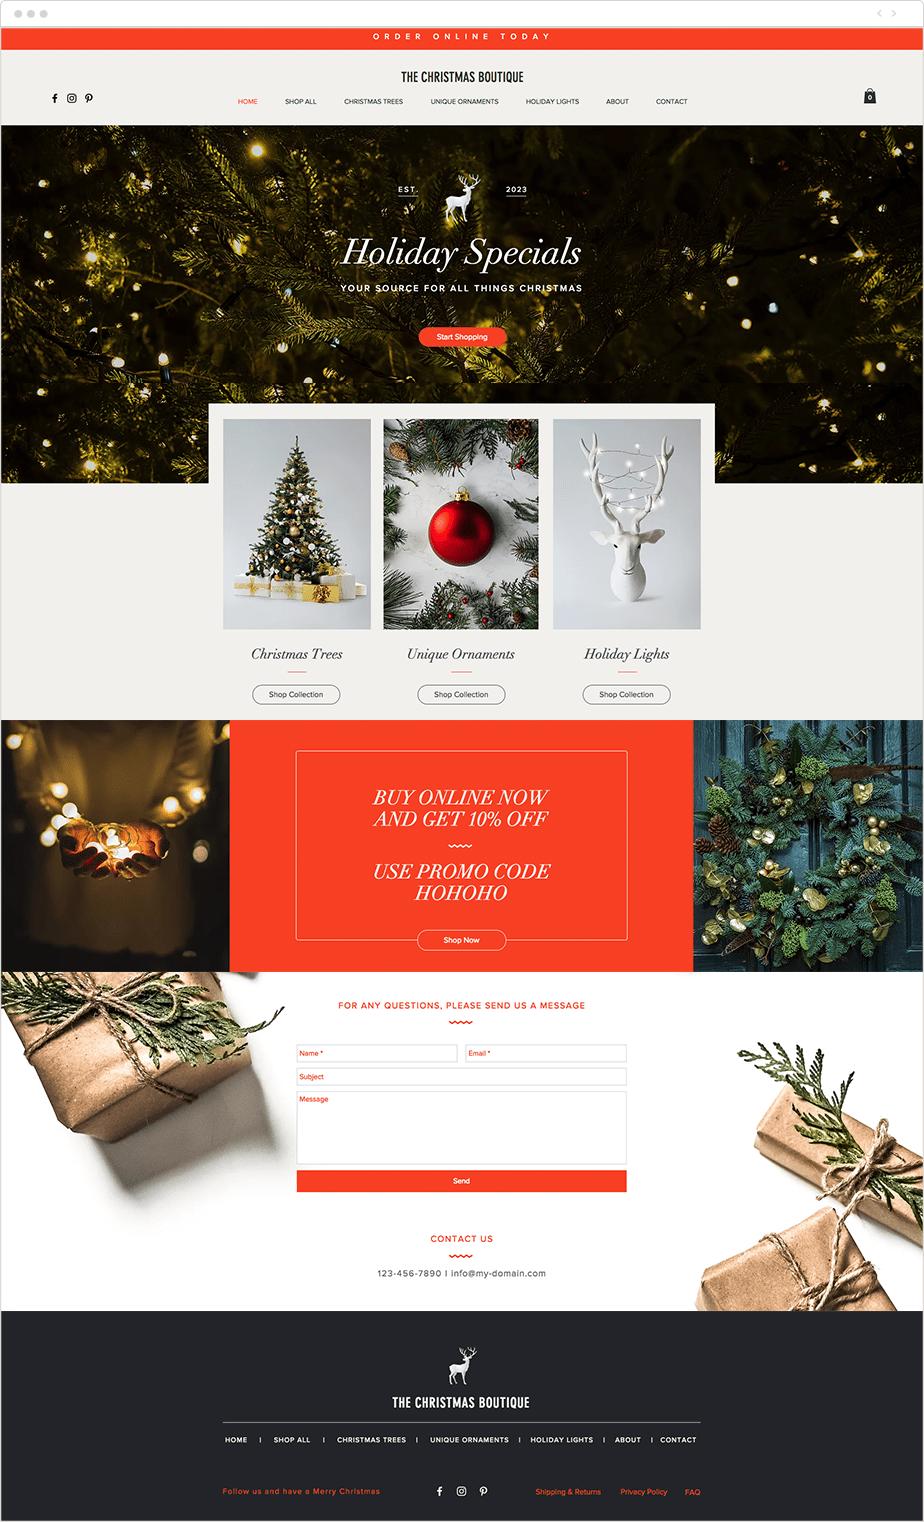 Christmas boutique website template